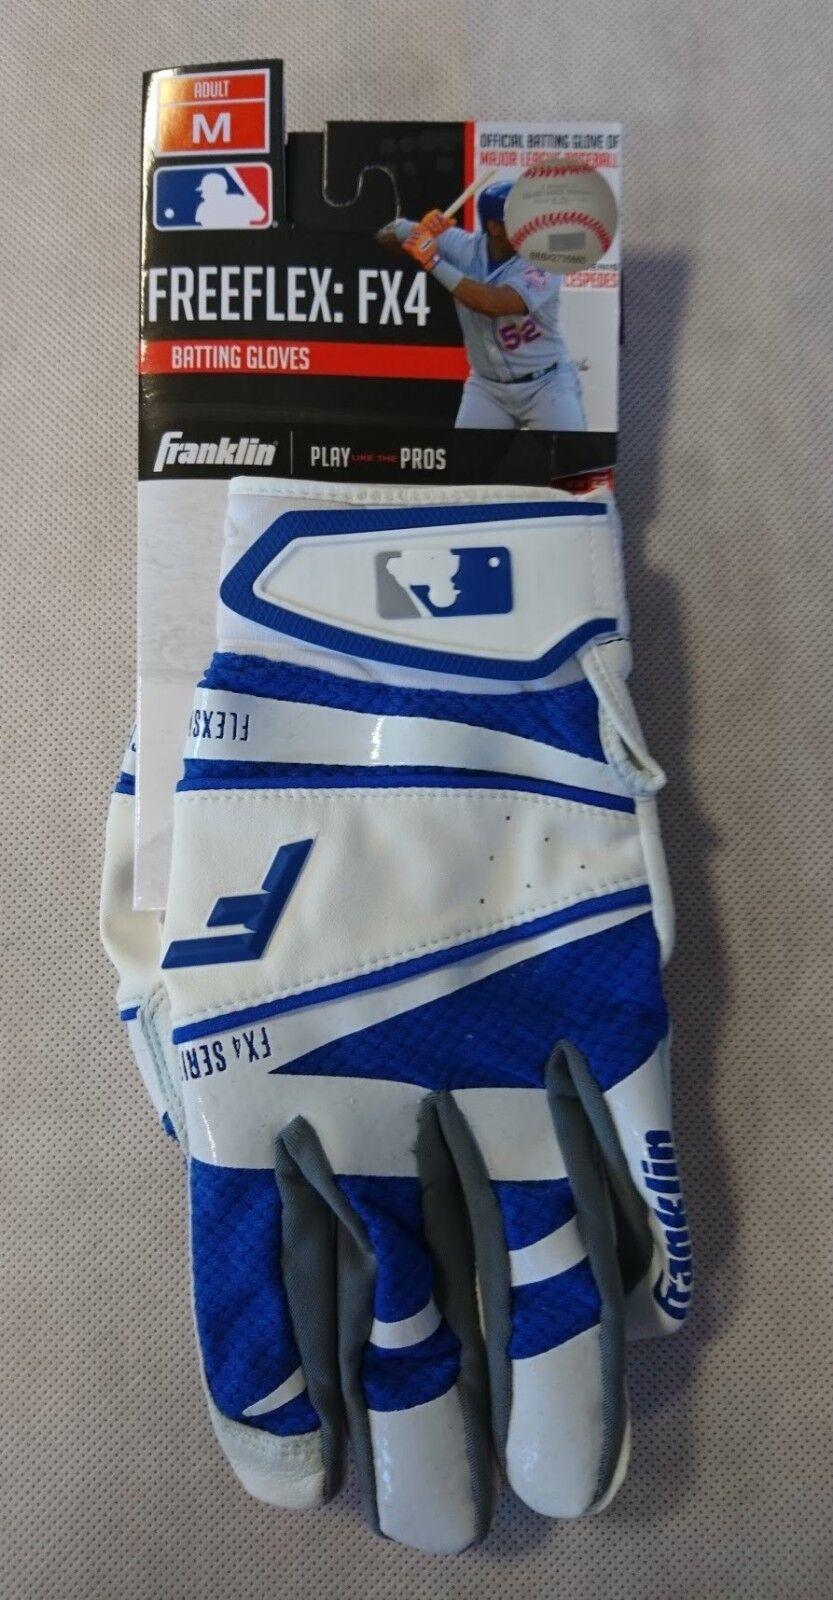 Franklin Batting Glove Freeflex FX4 - - - ADULT - Gr. M - Baseball-Handschuh weiß 5a5987